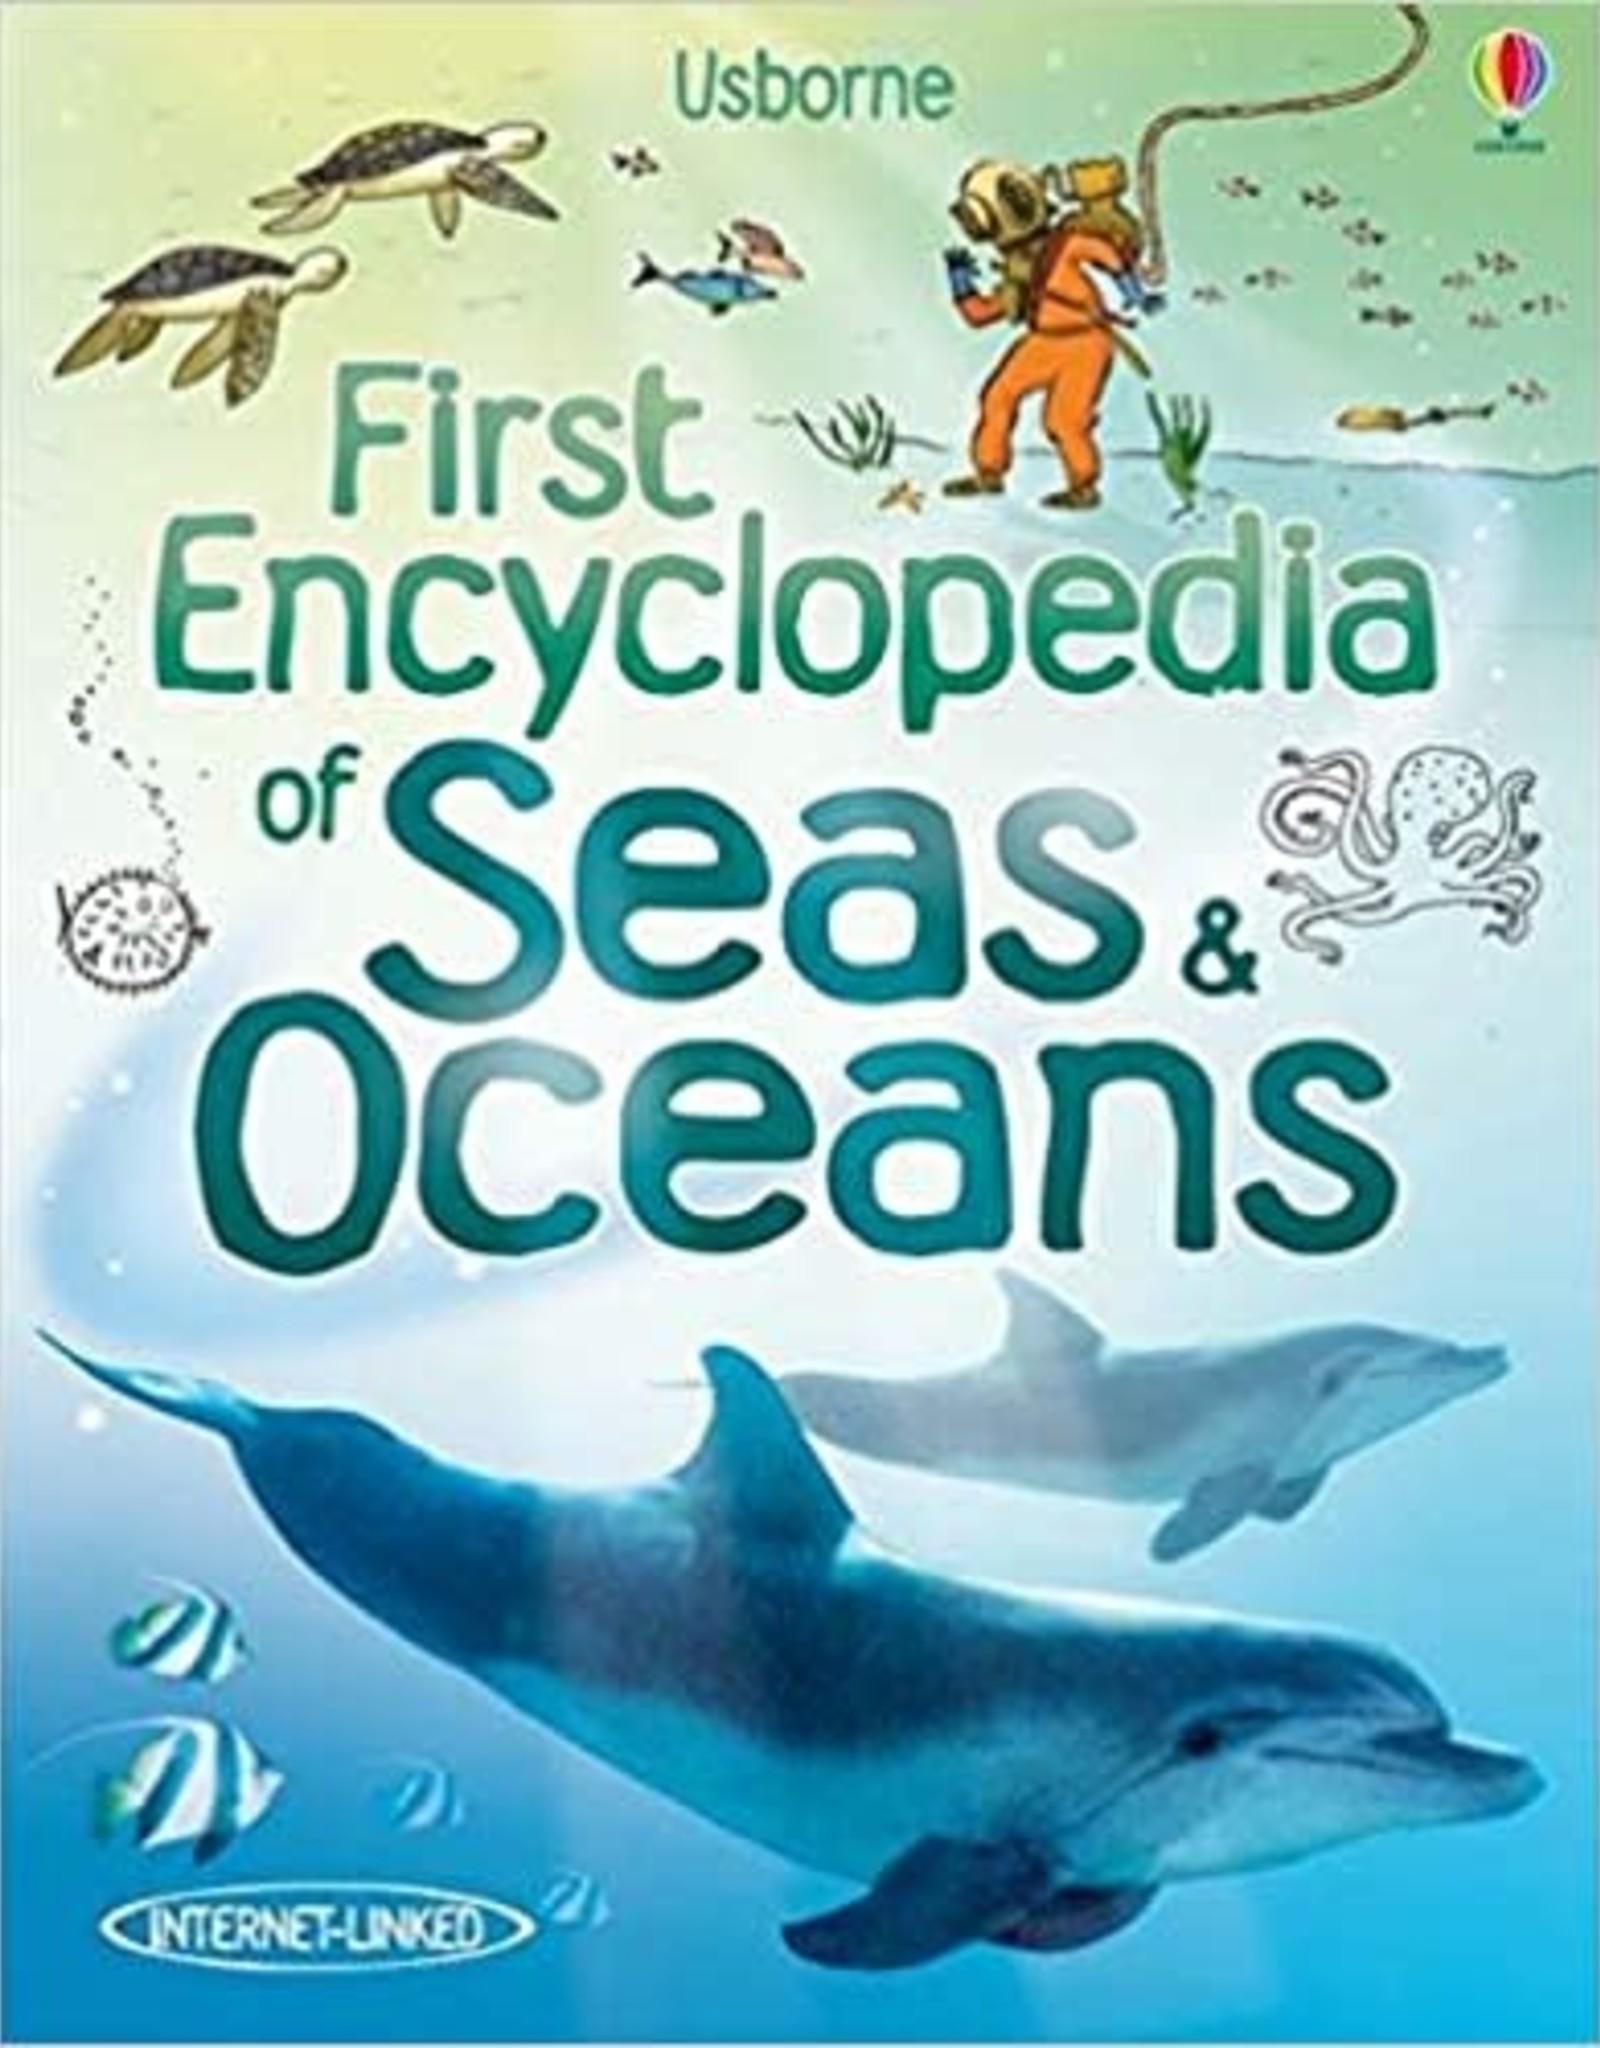 Usborne First Encyclopedia of Seas & Oceans